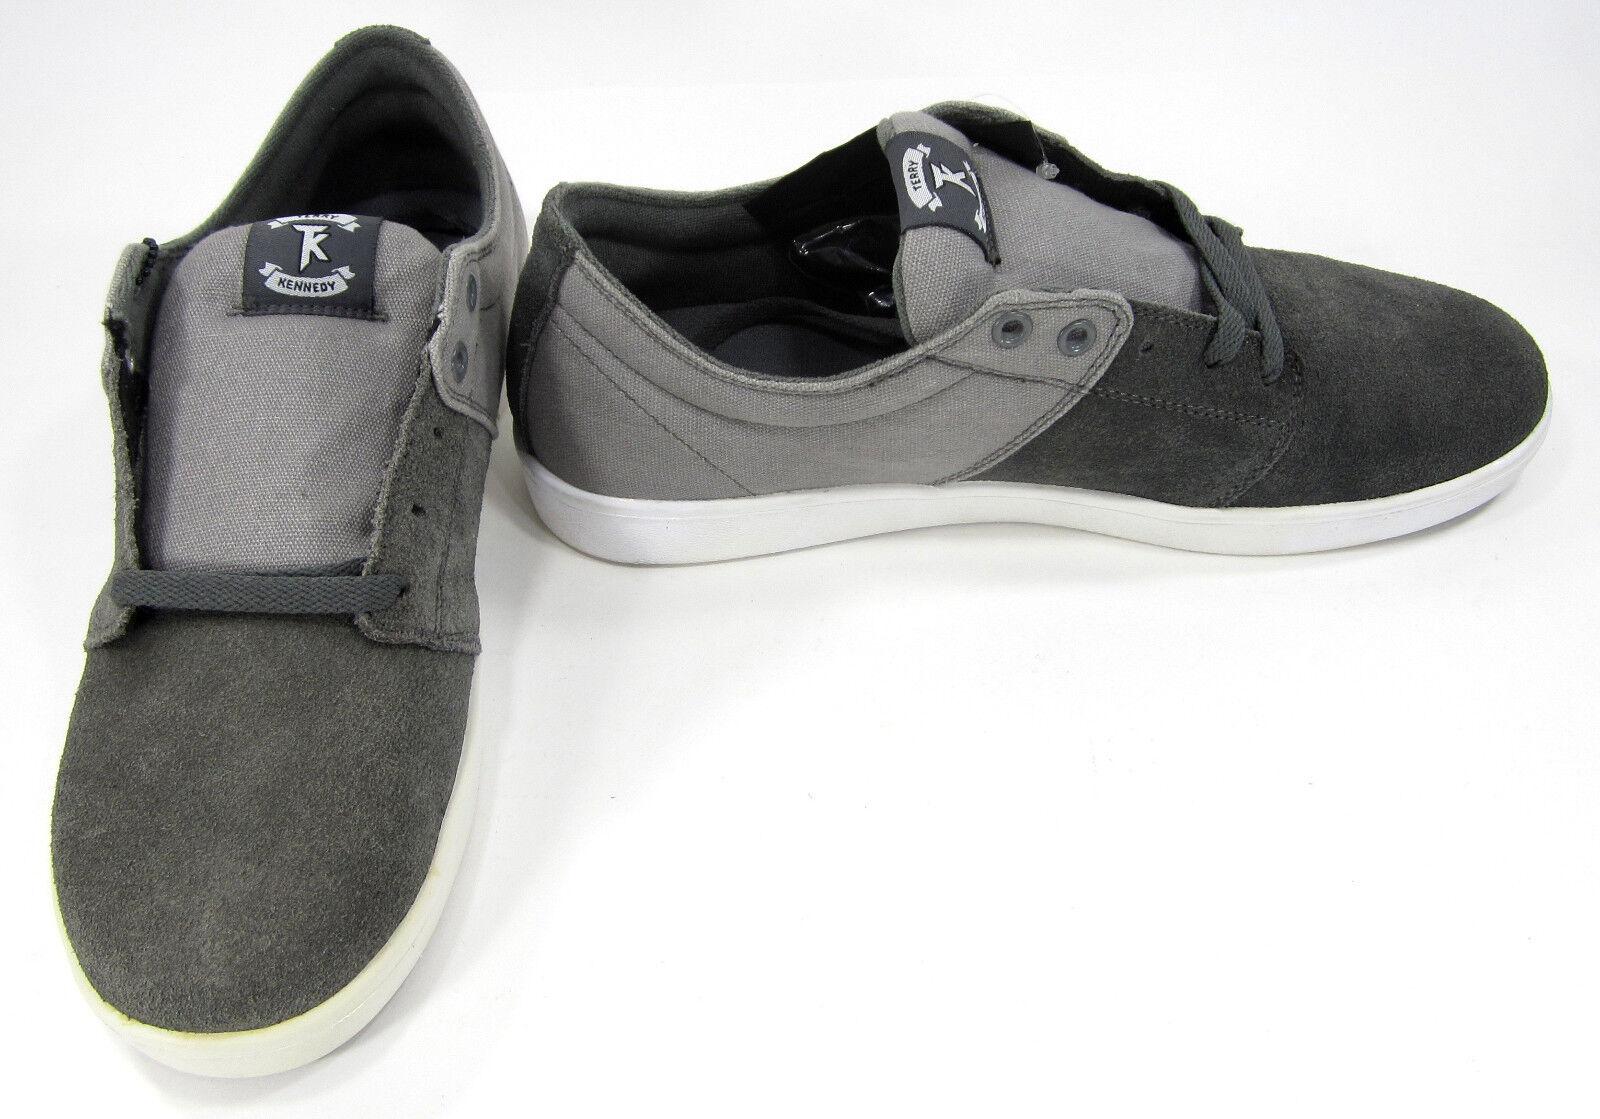 Sopra le scarpe scarpe scarpe stacks lo tela / greves grigio scarpe taglia 12 7877e1